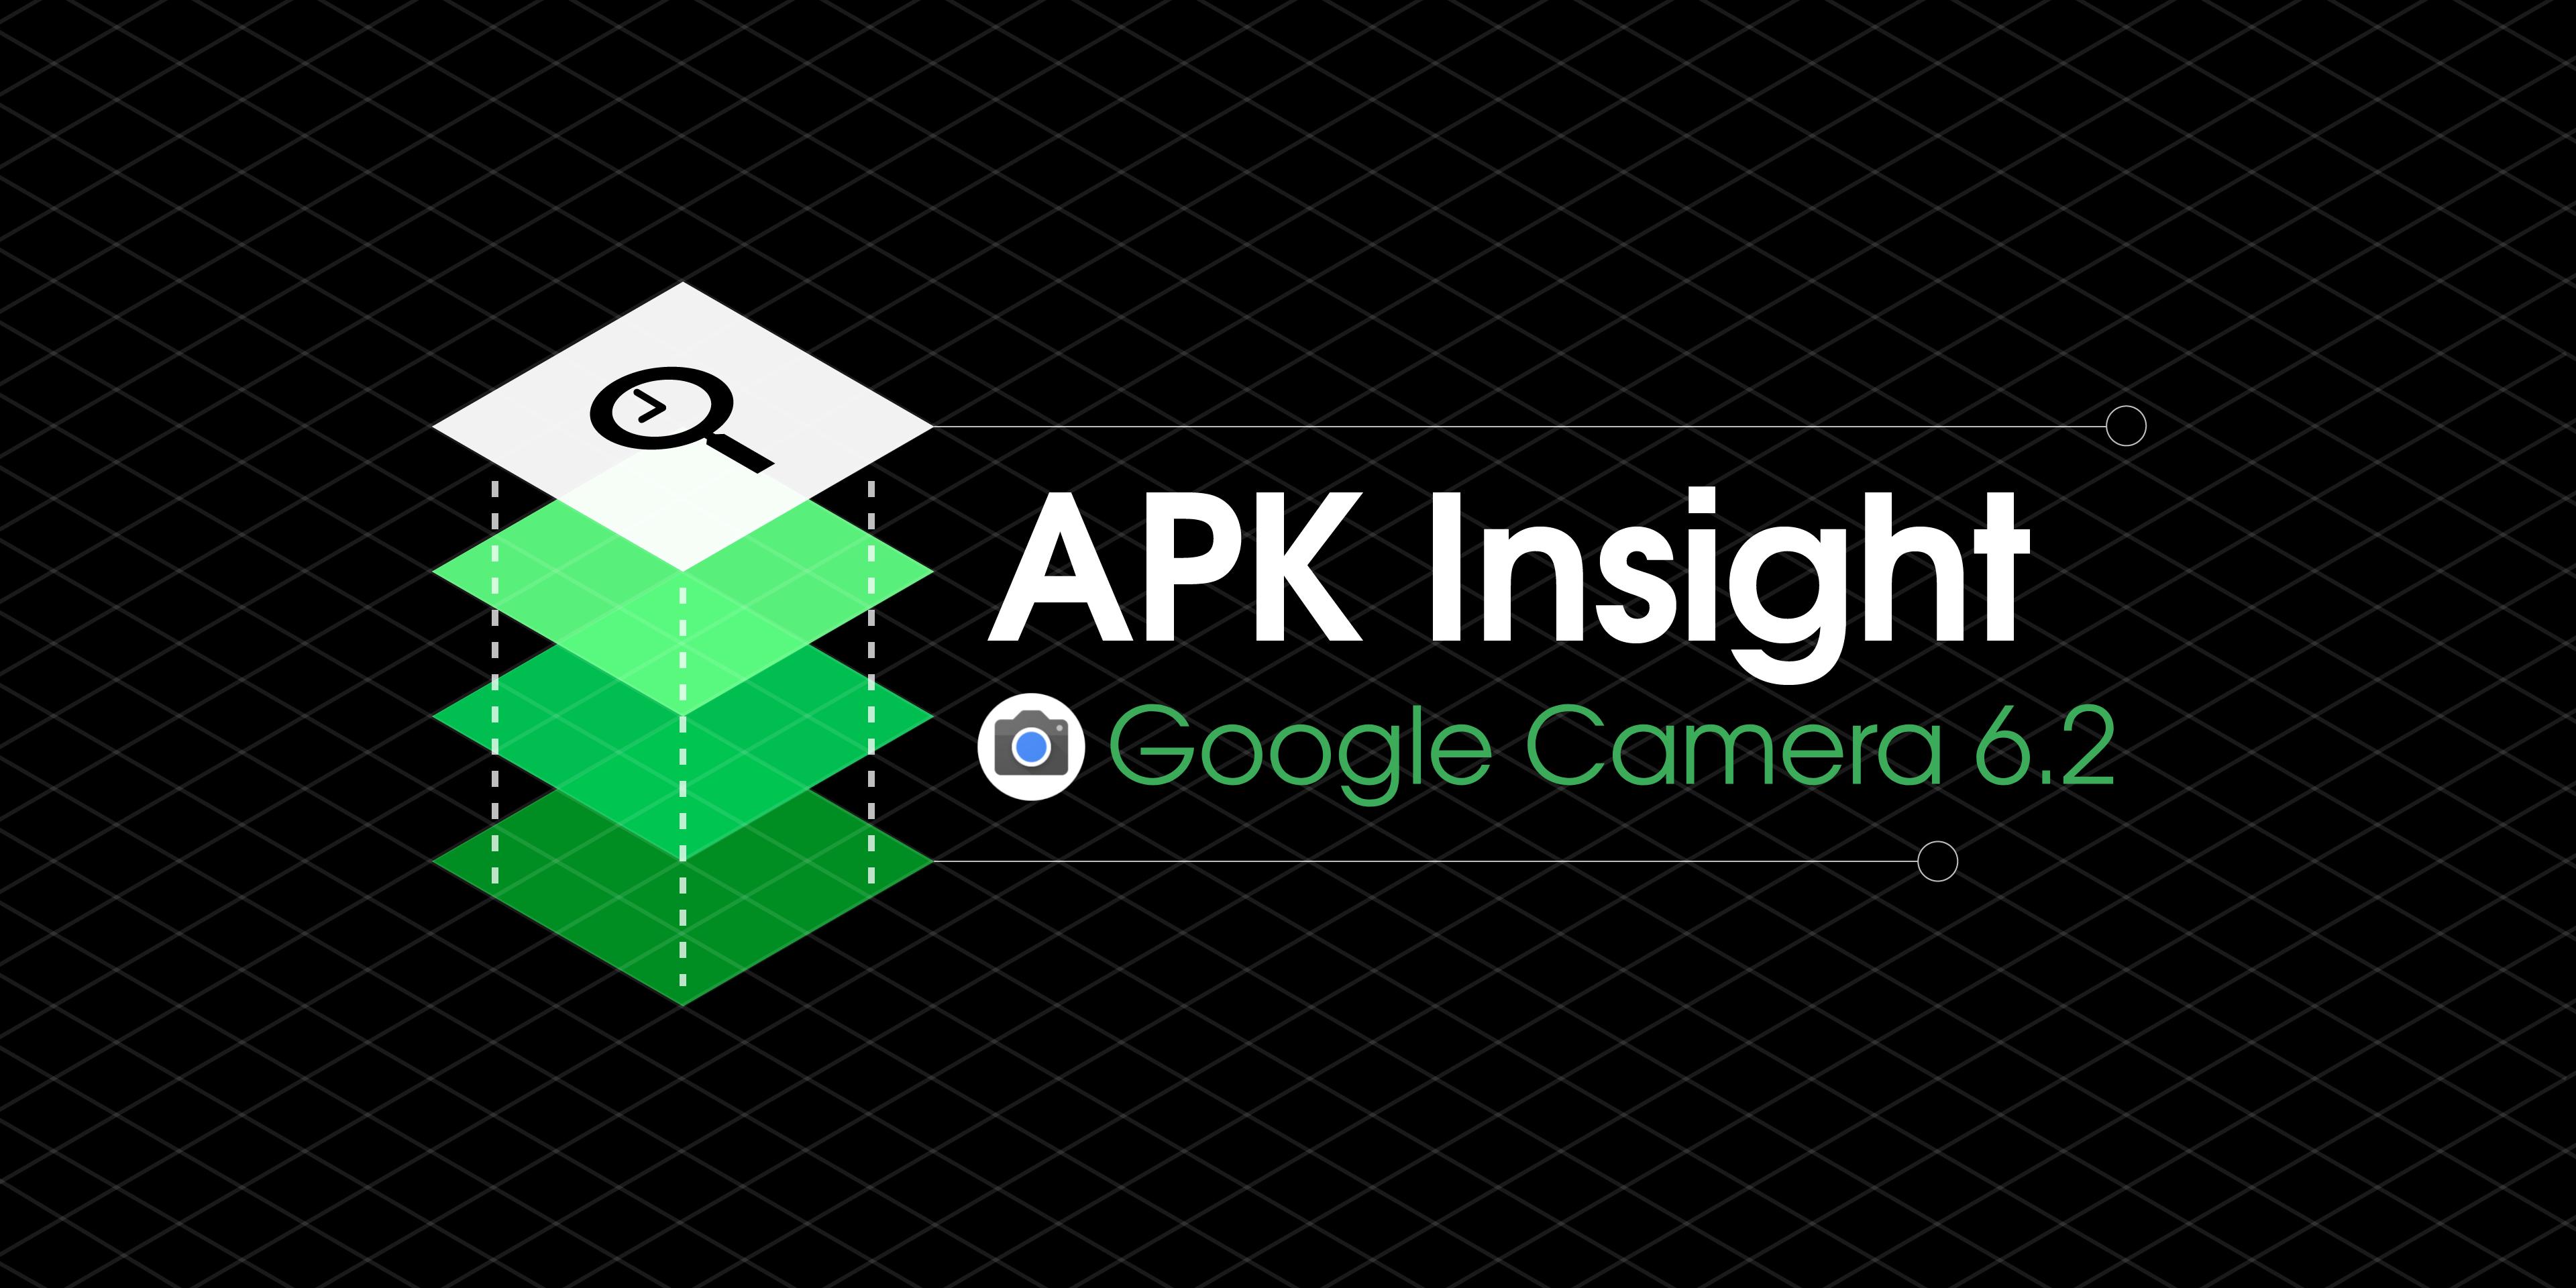 Google Camera 6.2 adds settings dark mode, preps 'Measure mode' & 'Cheetah' [APK Insight]